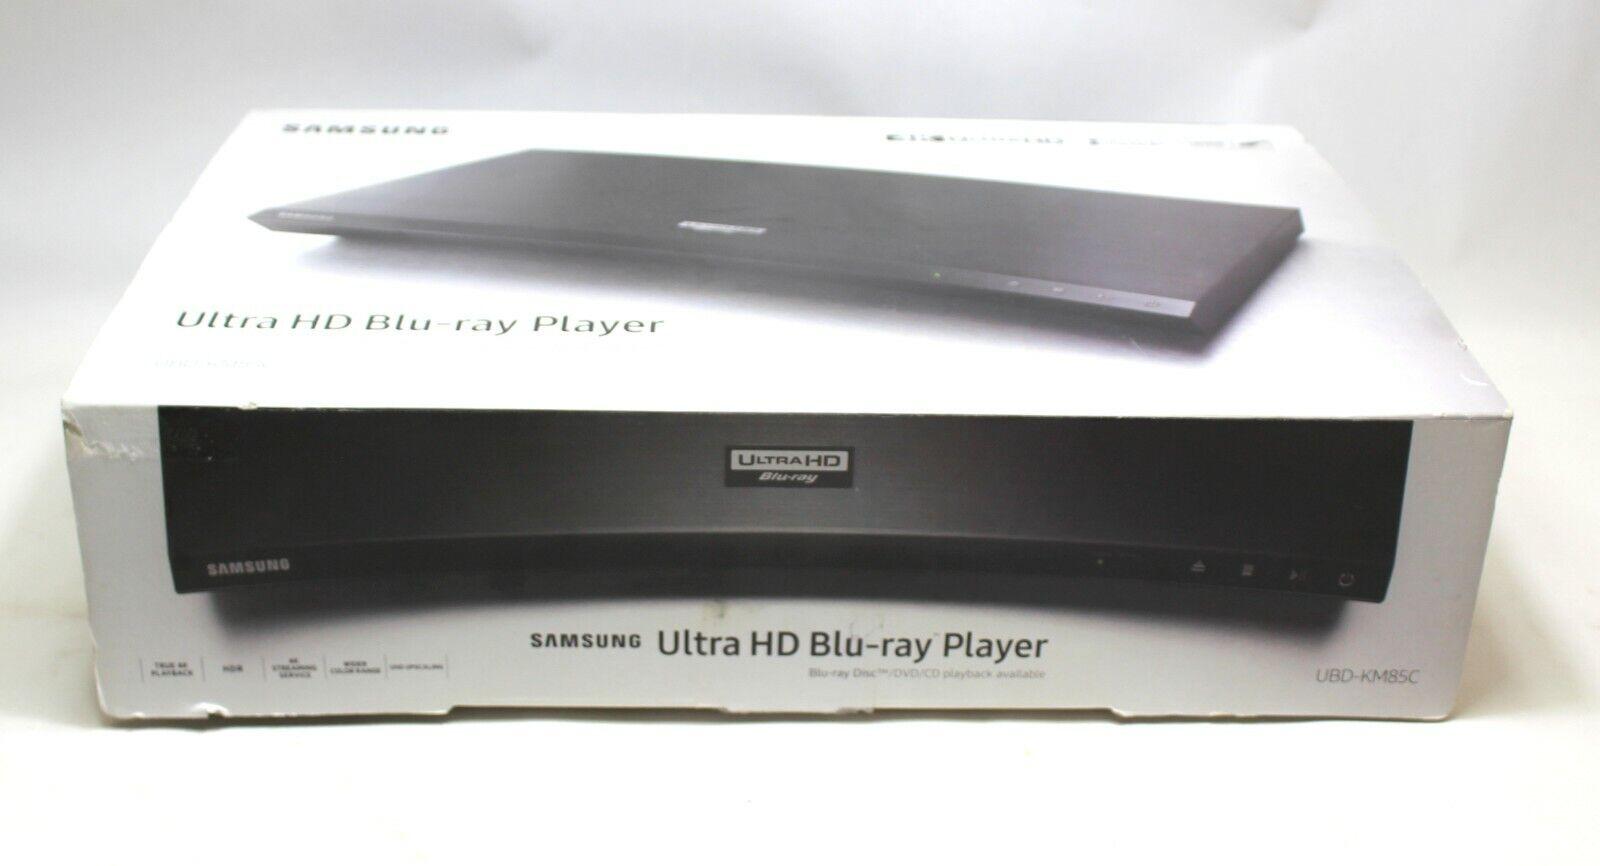 Samsung (UBD-KM85C) 4K Ultra-HD Streaming Blu-Ray Player Built-in WiFi W/ Remote player remote samsung streaming wifi